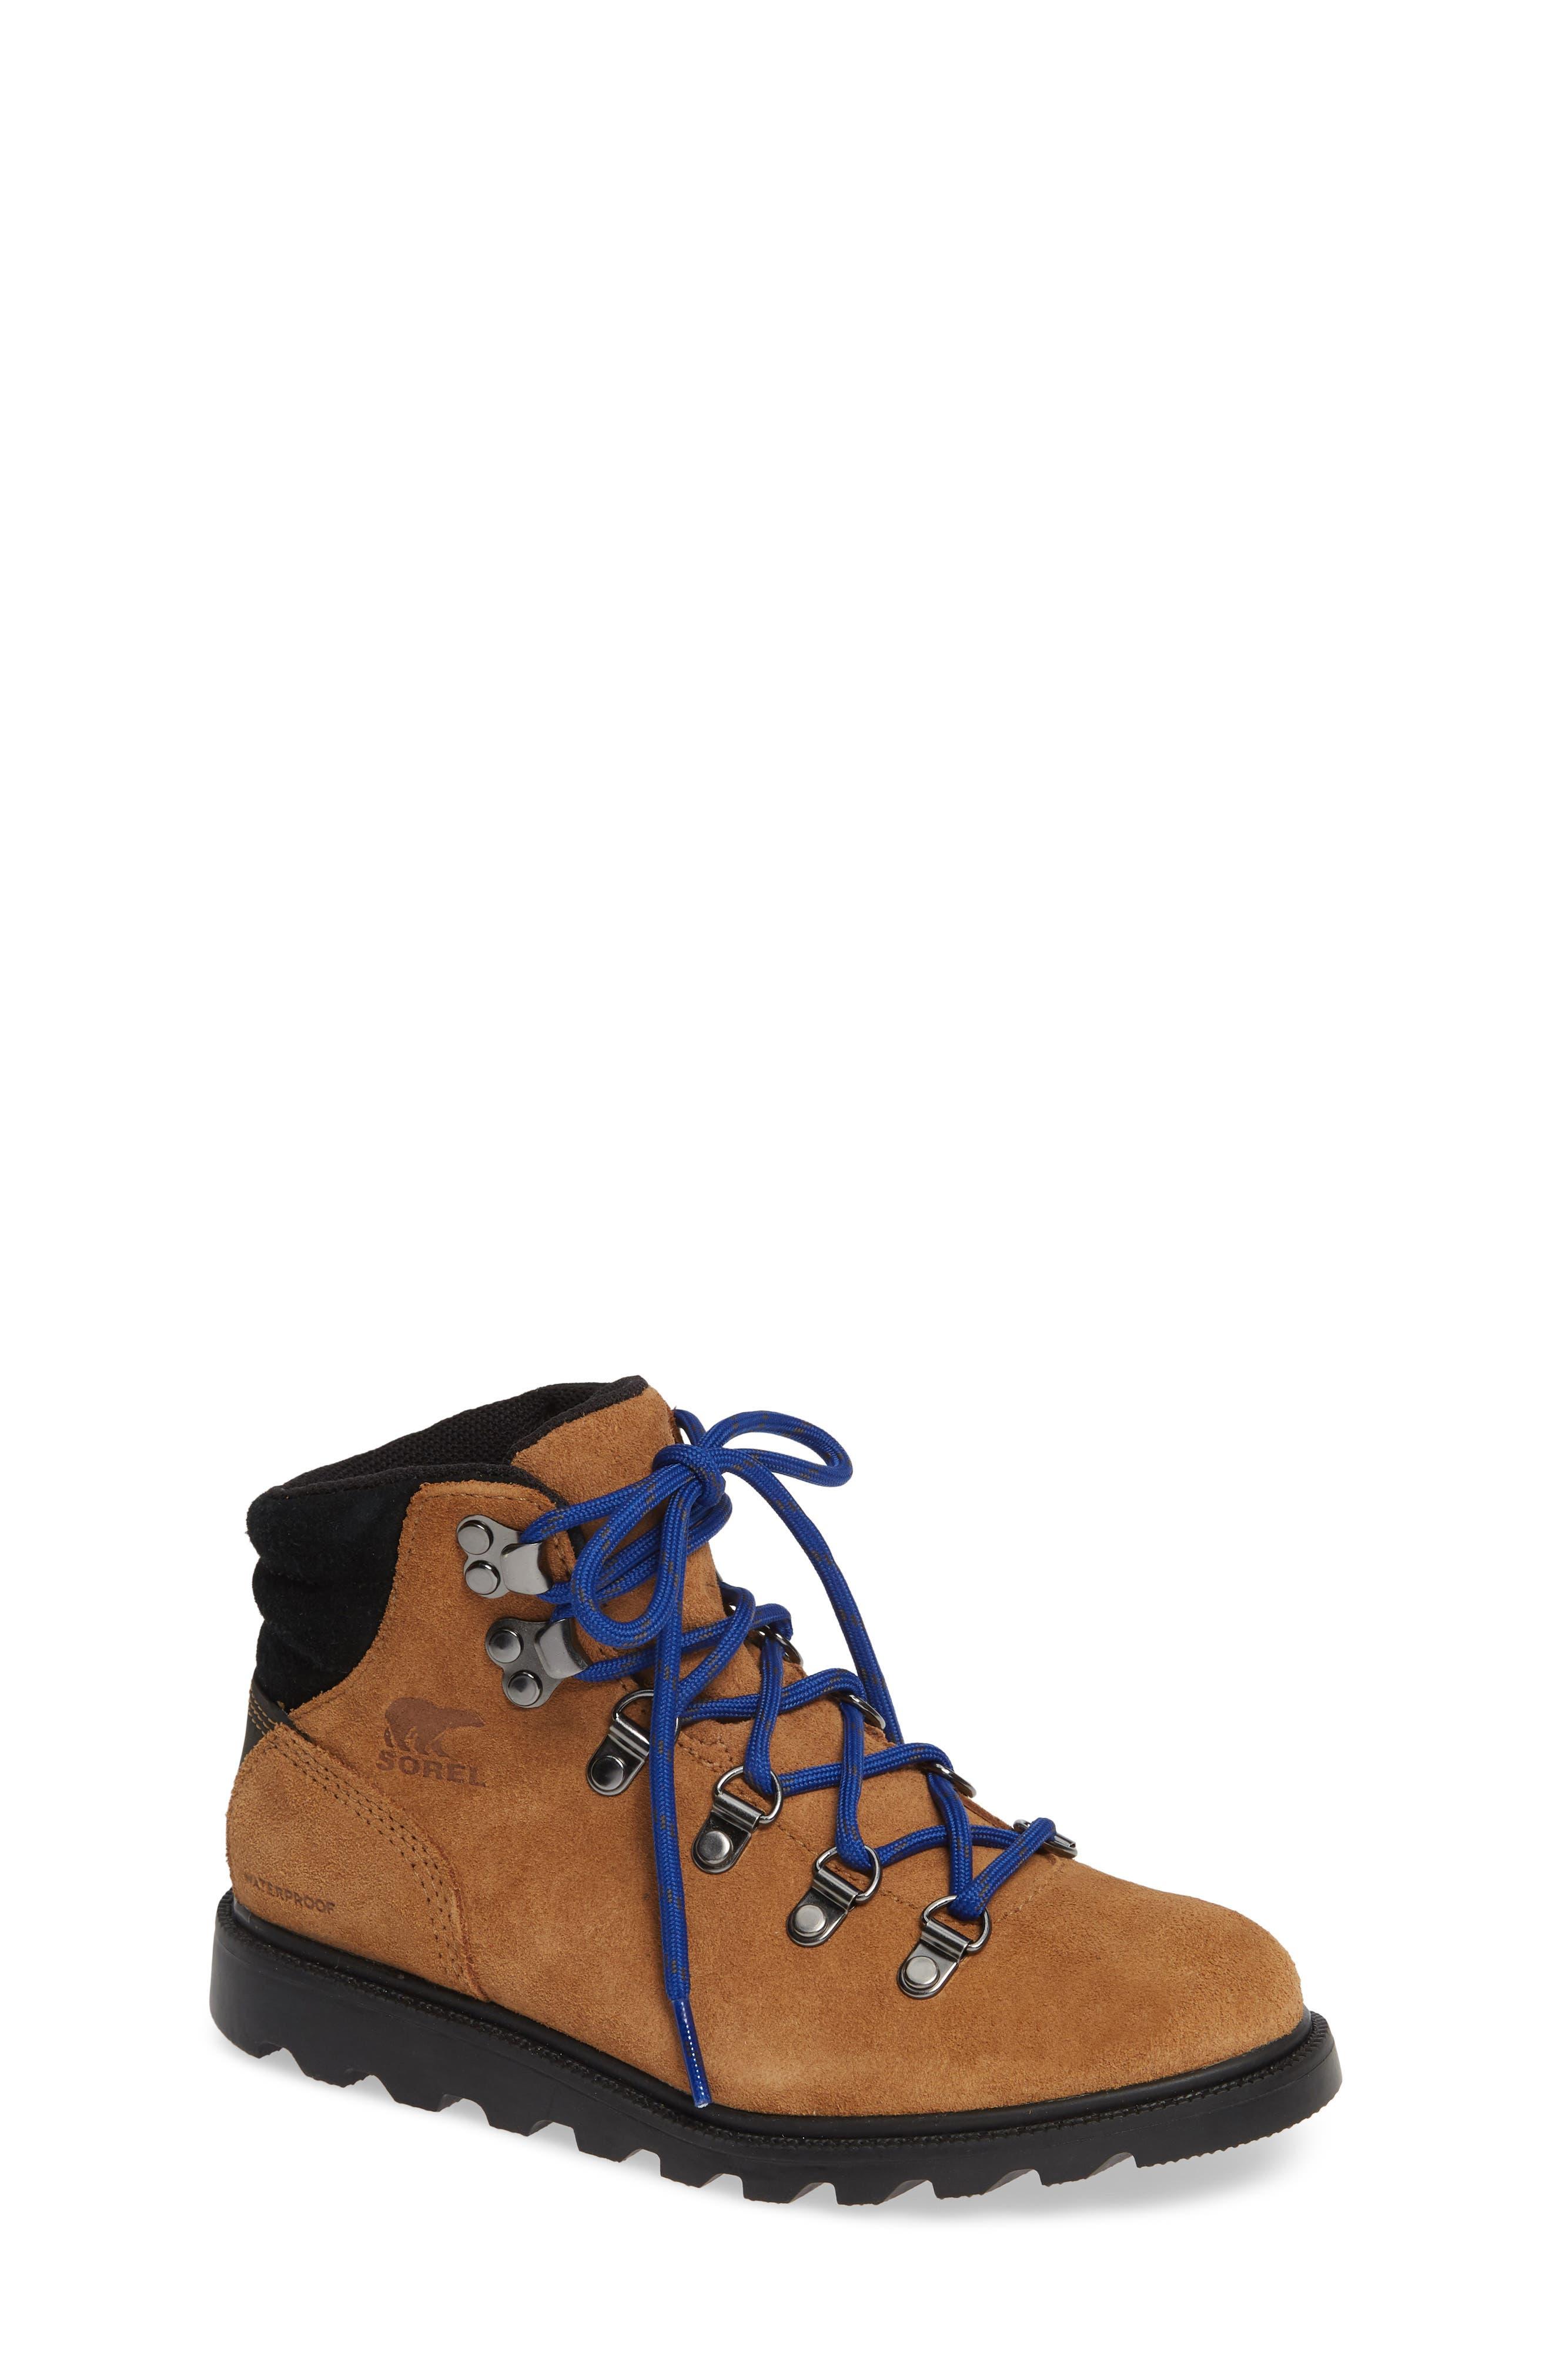 Madison Waterproof Hiker Boot,                         Main,                         color, CAMEL BROWN/ BLACK